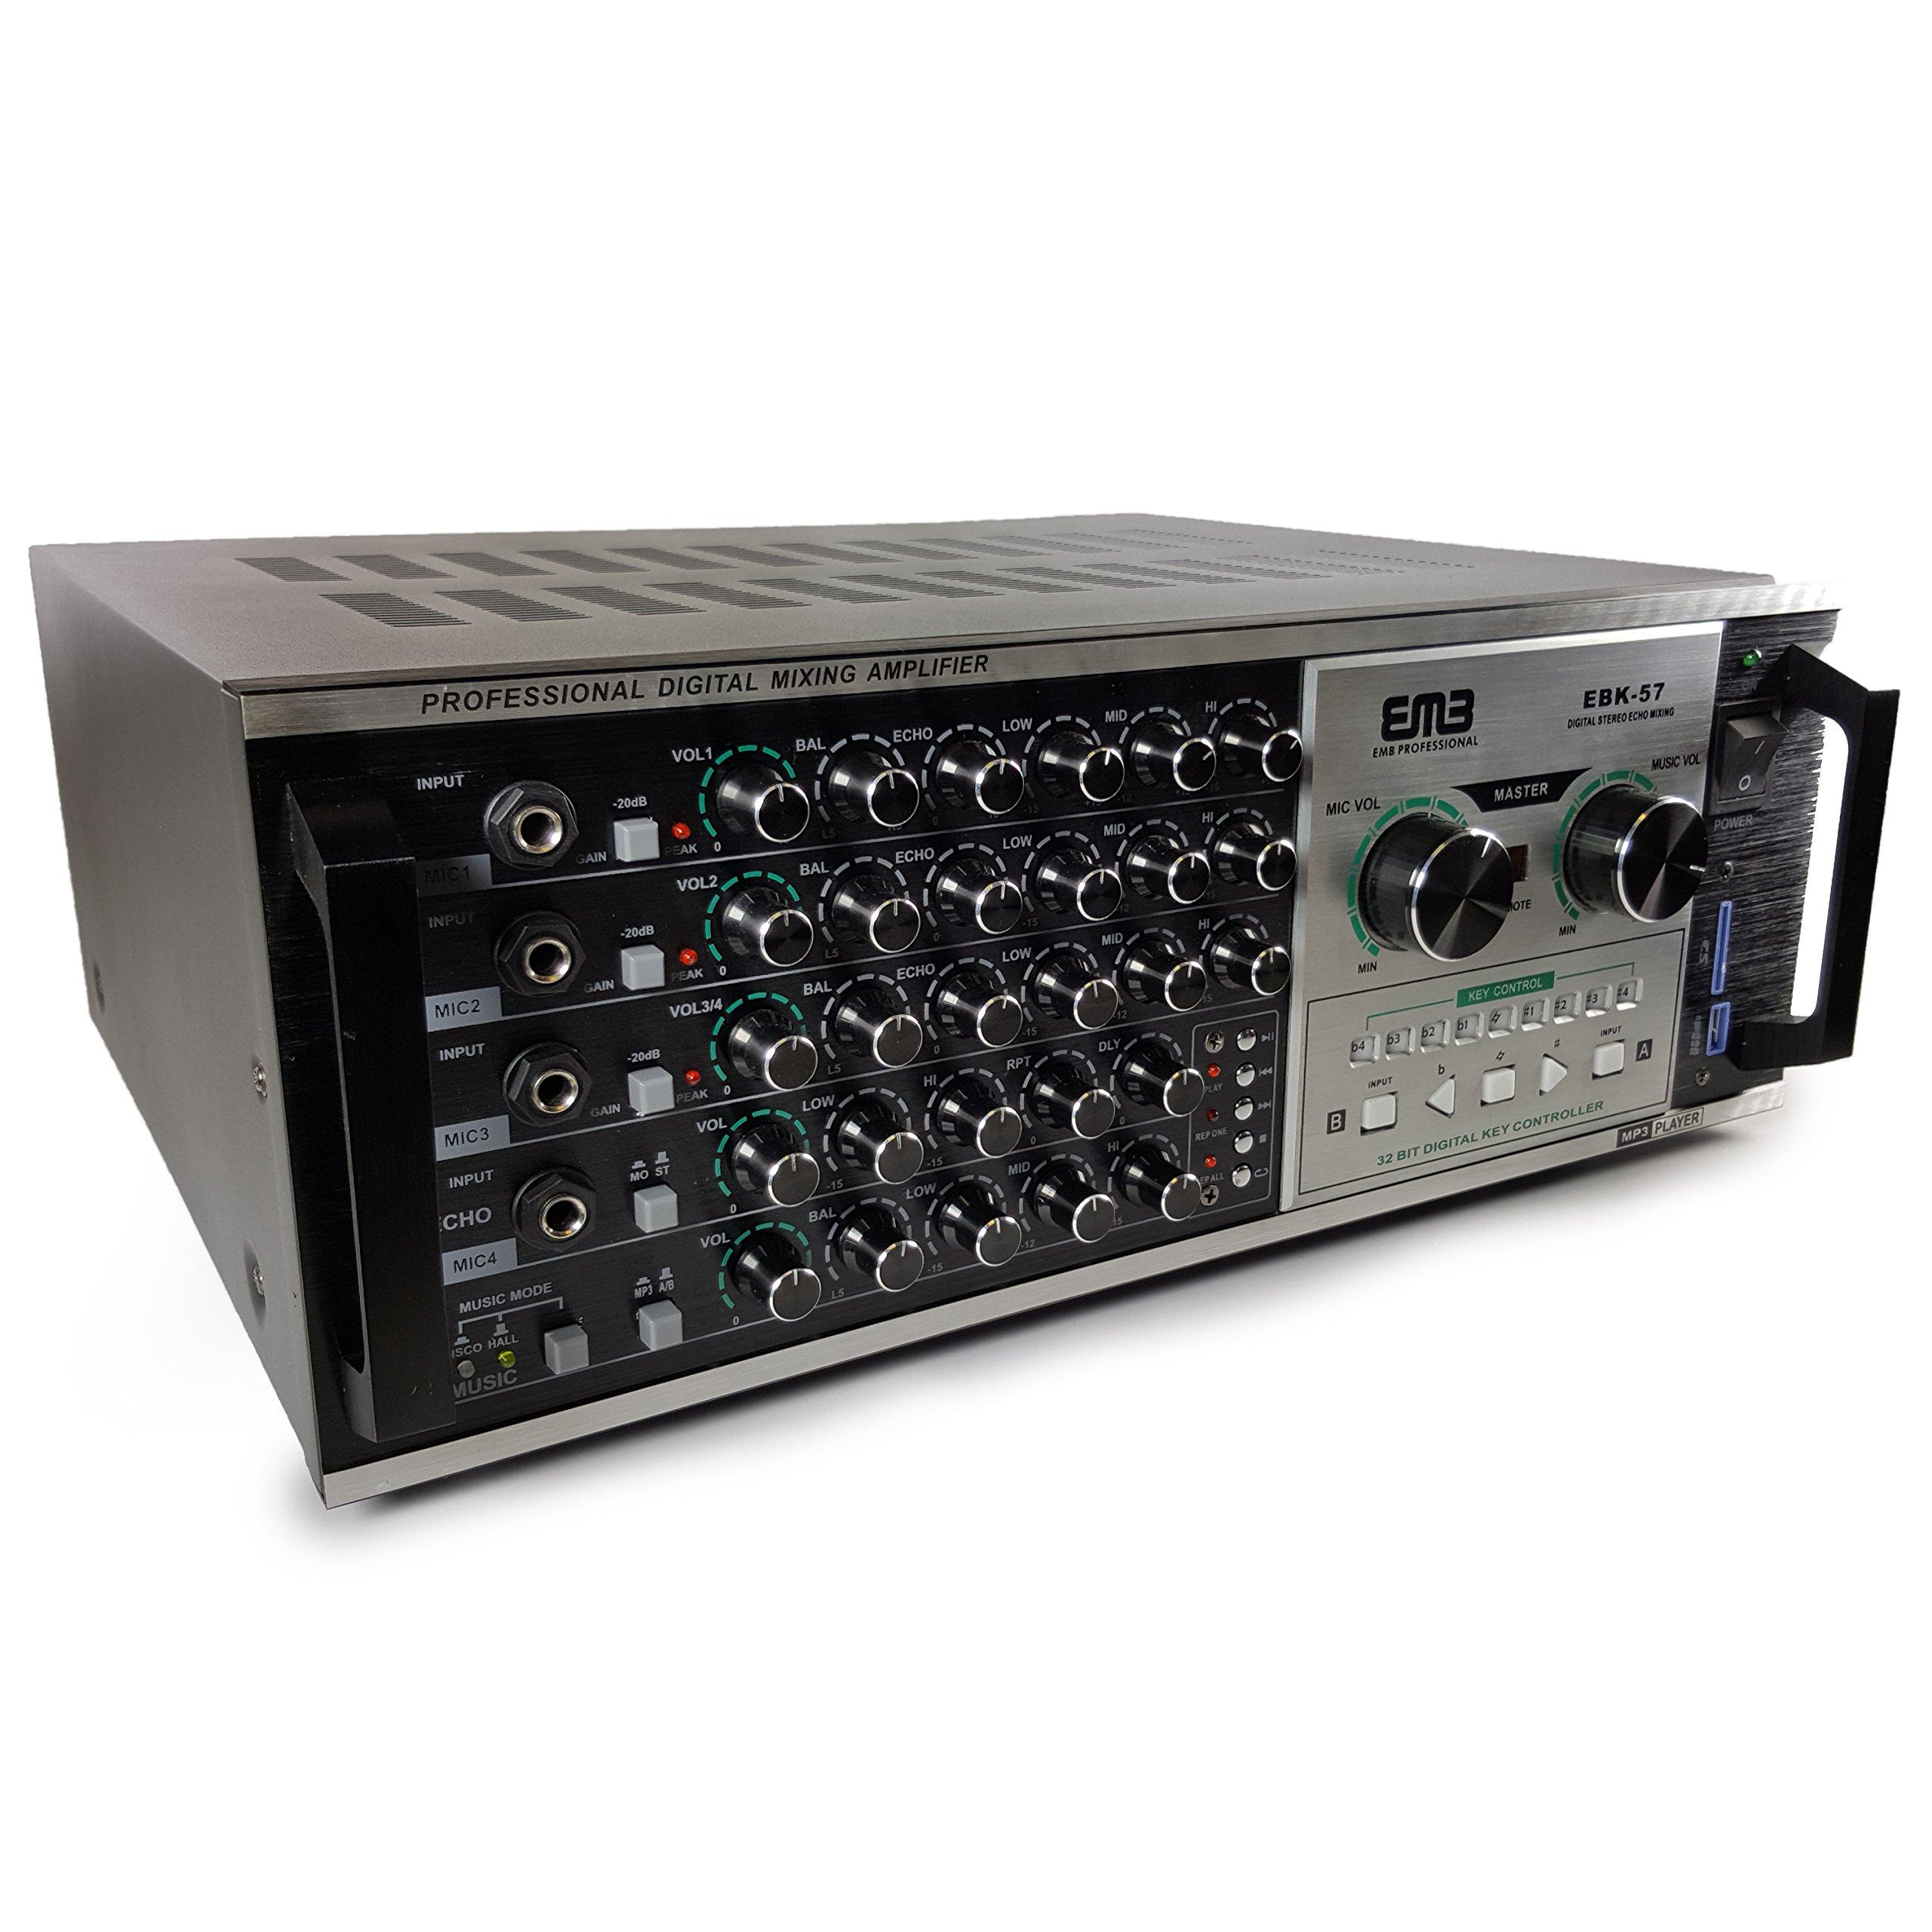 EMP Professional EBK57 1200W Karaoke Echo Power Mixing Amplifier w/Remote/USB/SD/MP3/WMA Player